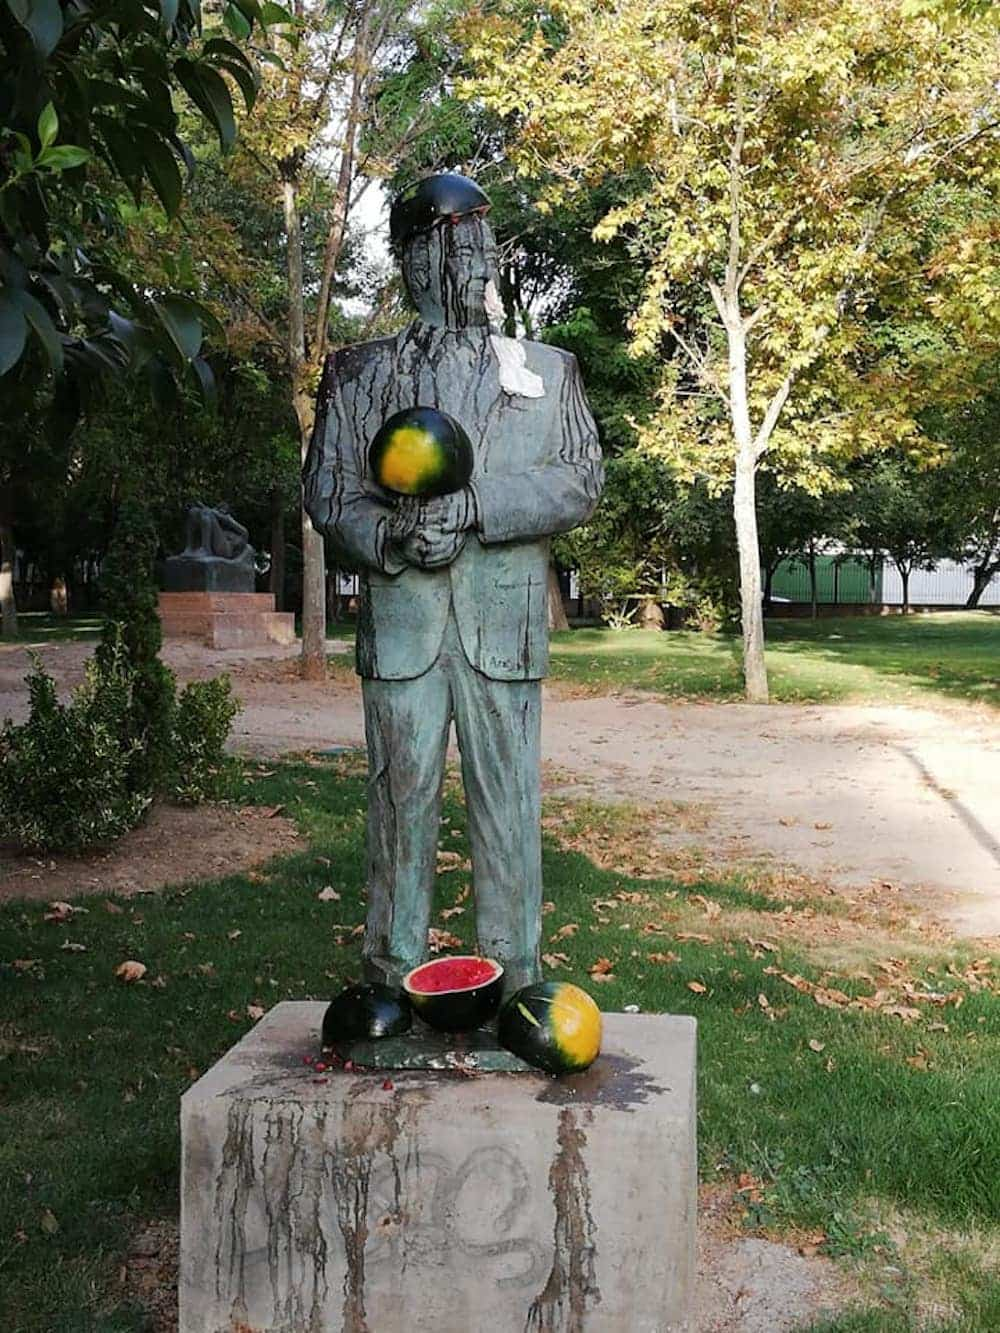 escultura agustin ubeda herencia - Vandalismo sobre la escultura de Agustín Úbeda en Herencia